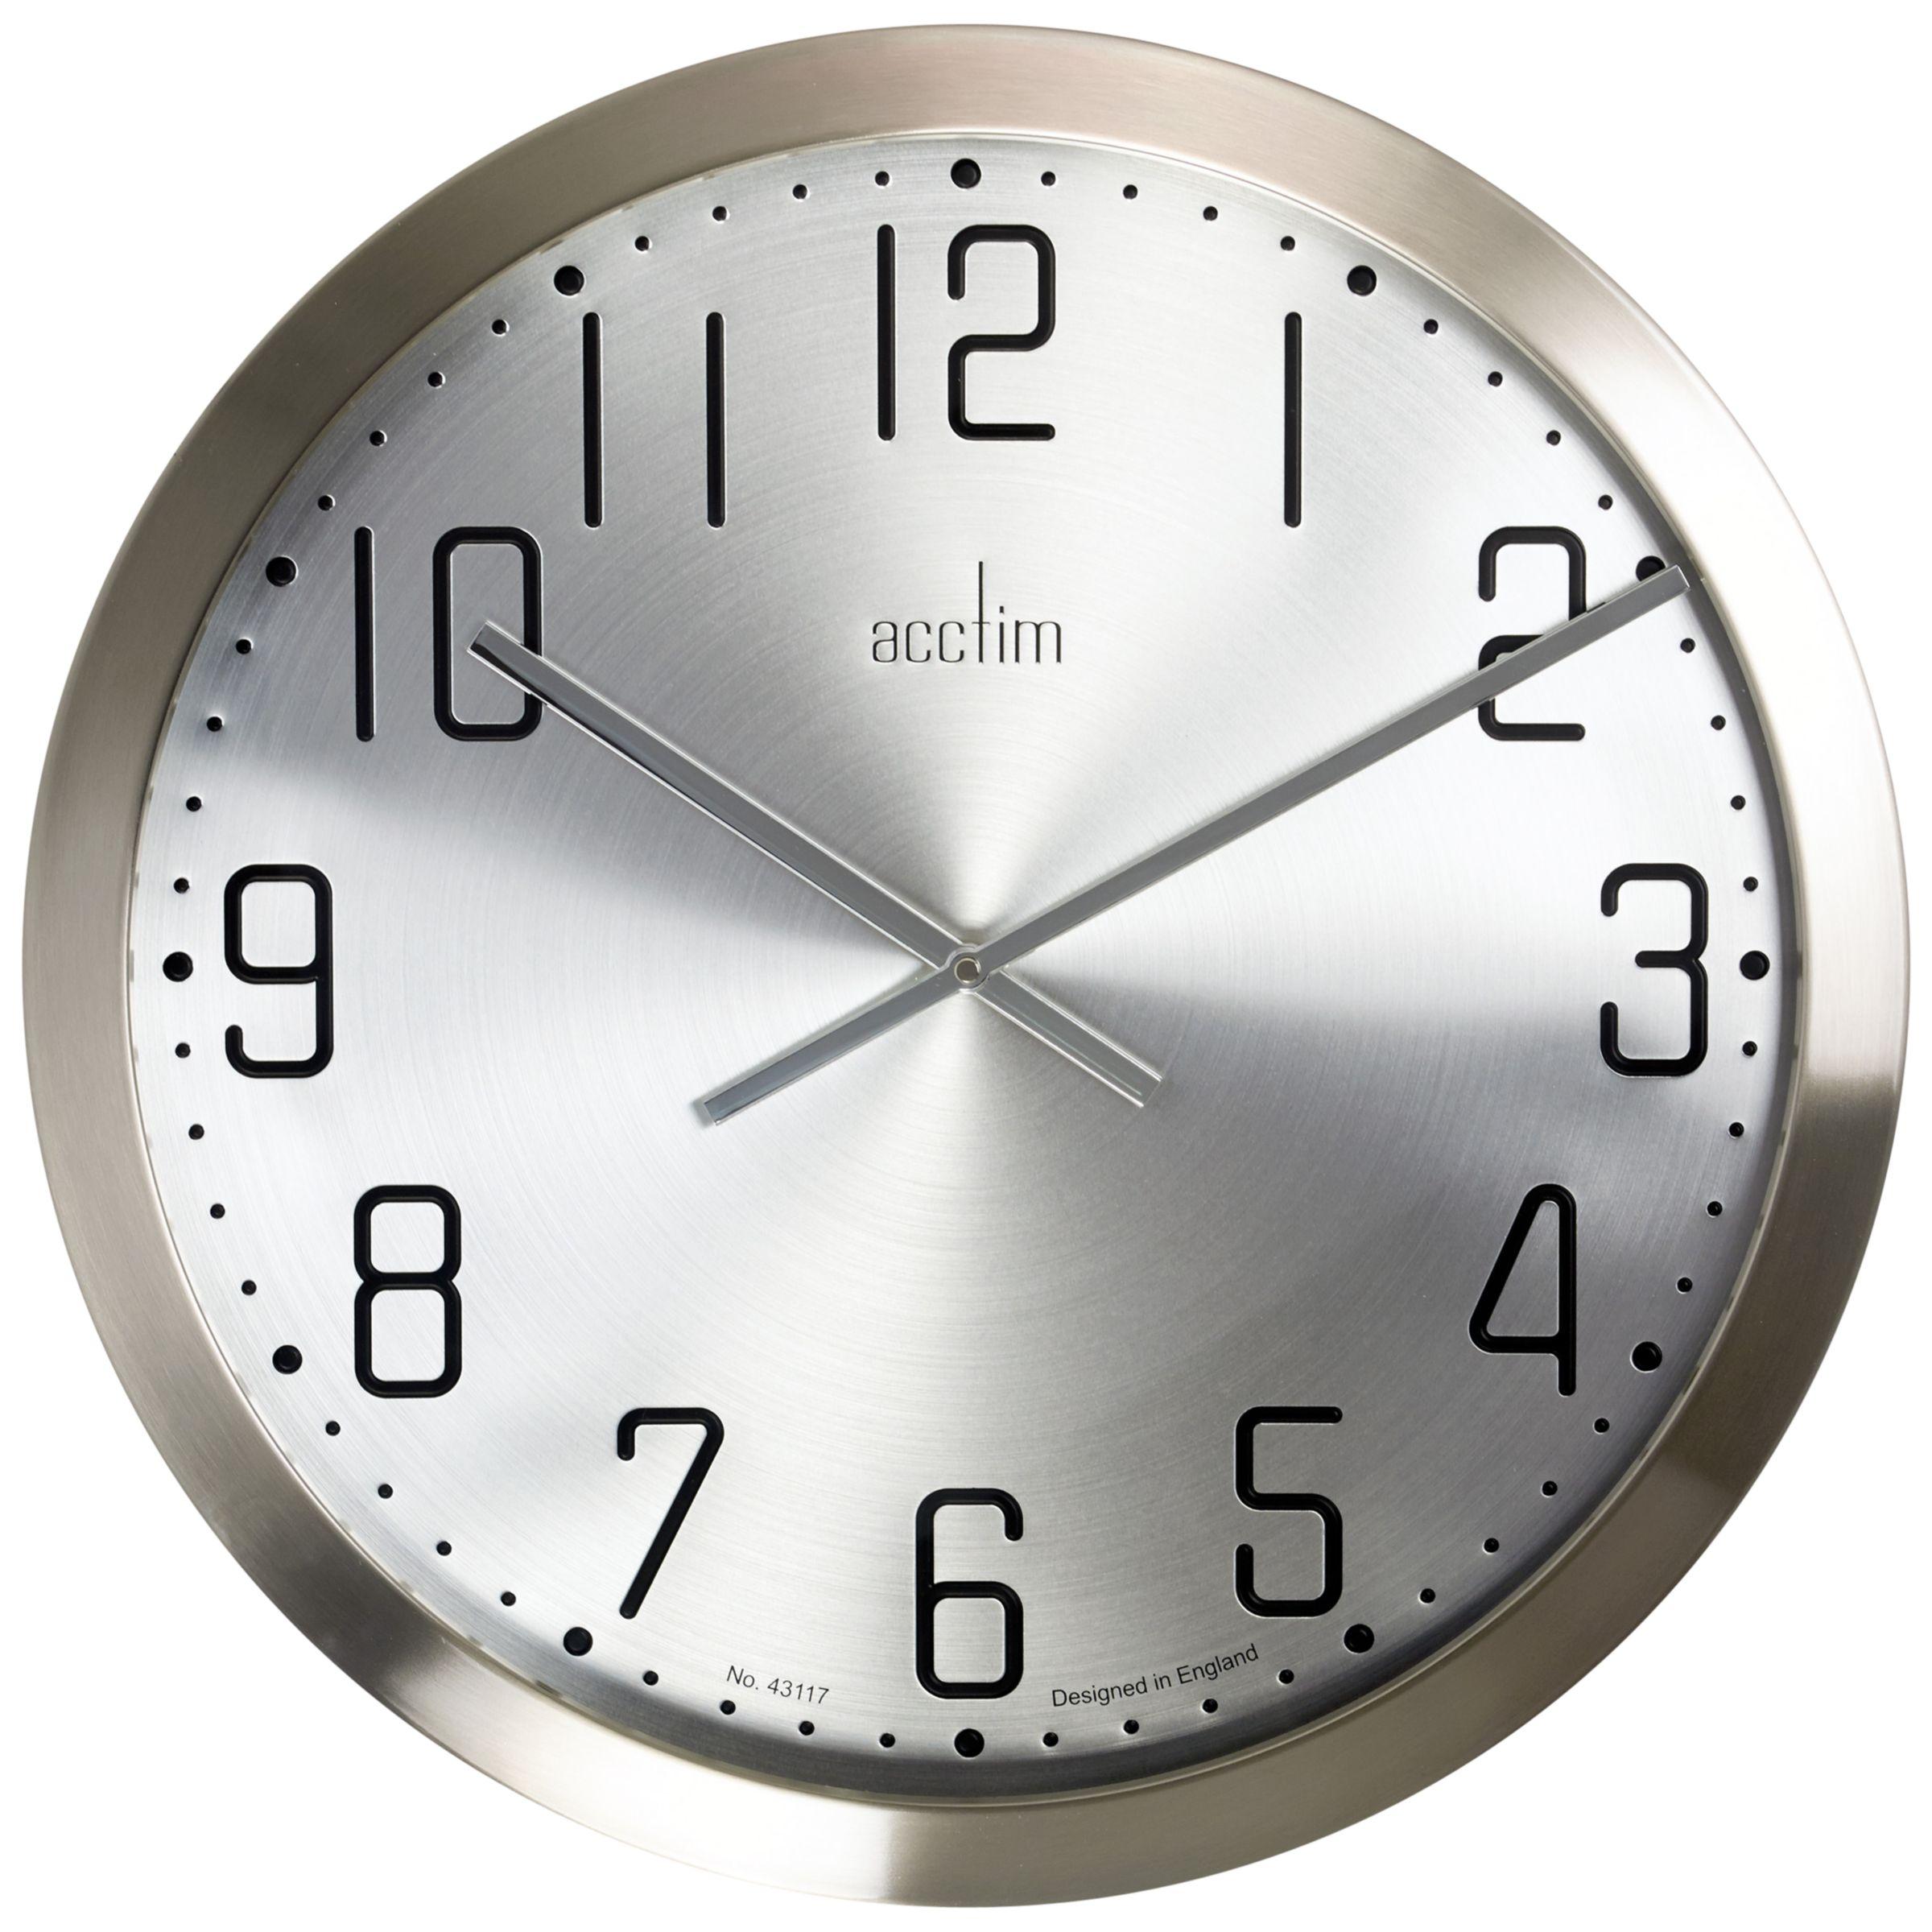 Acctim Acctim Alvik XL Wall Clock, Silver, 50cm